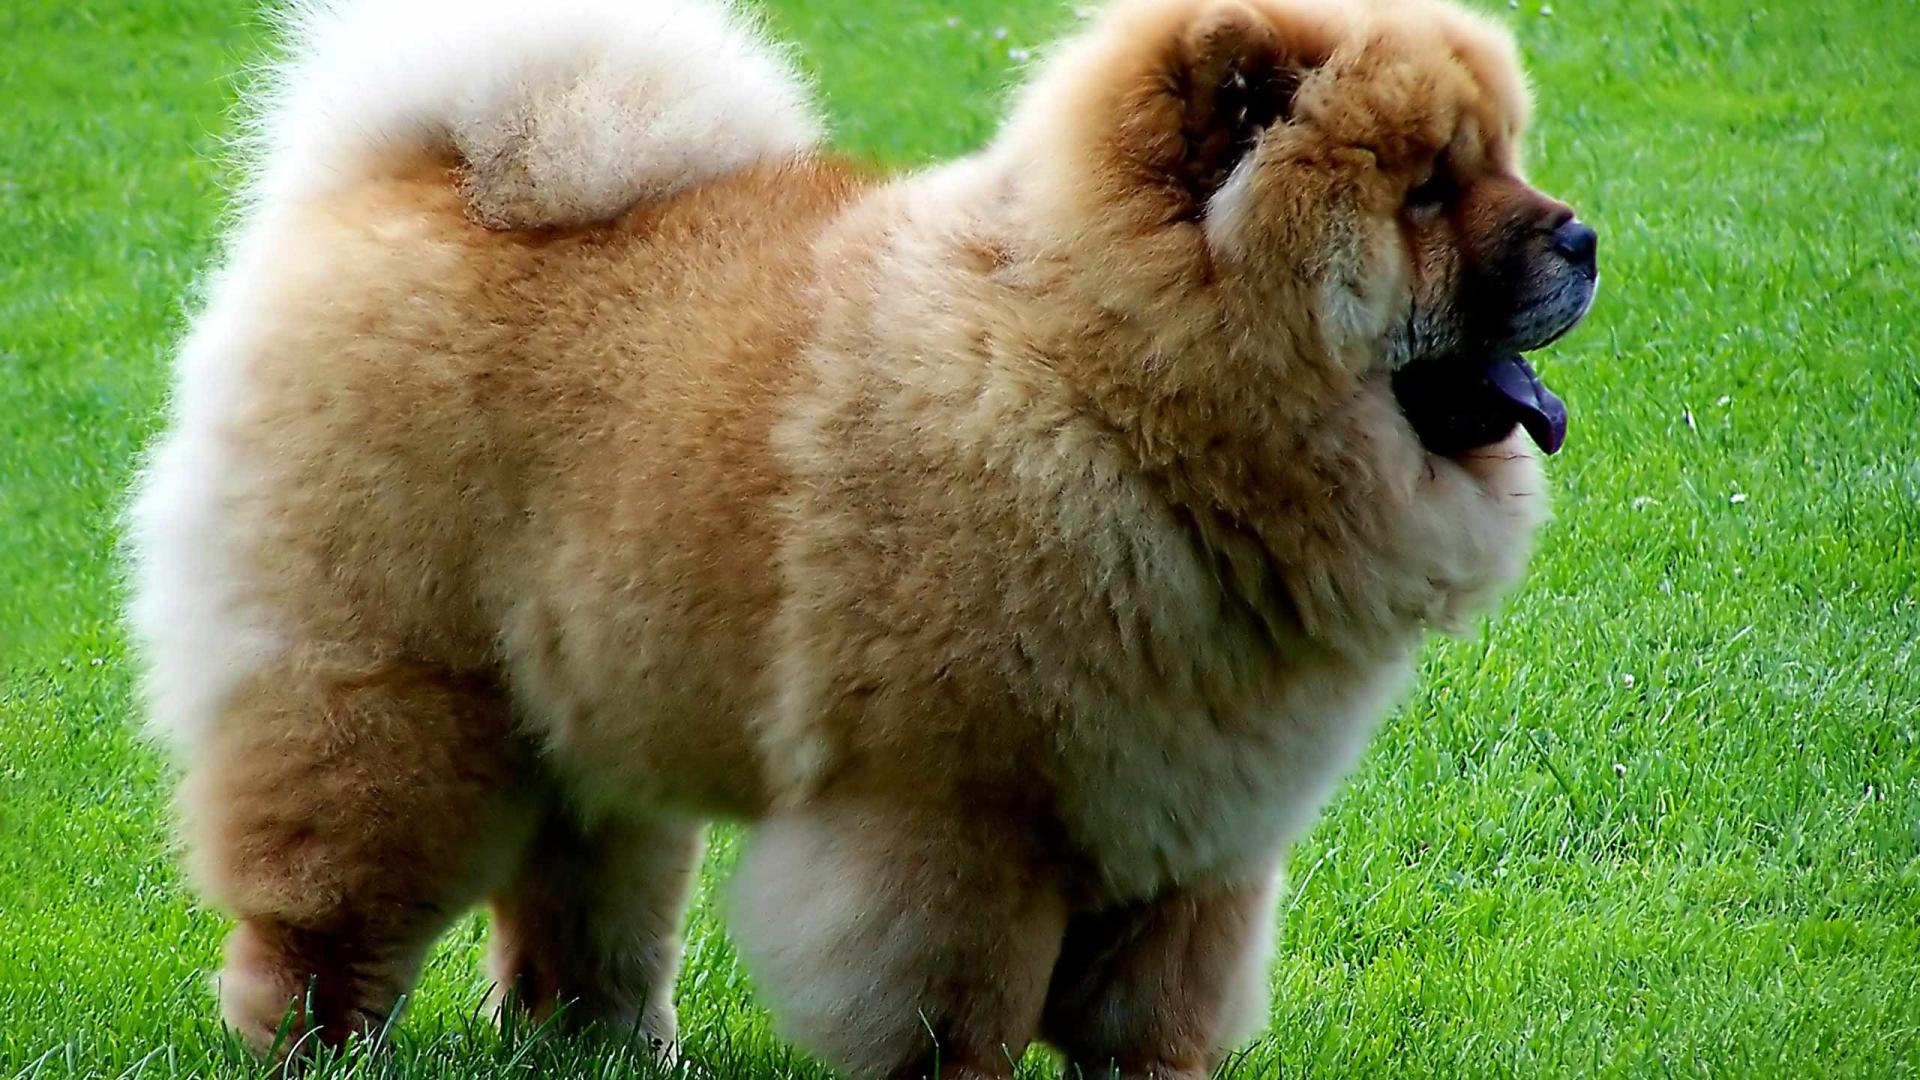 Beautiful-Brown-Puppy-Dog-wallpaper-wp5603272